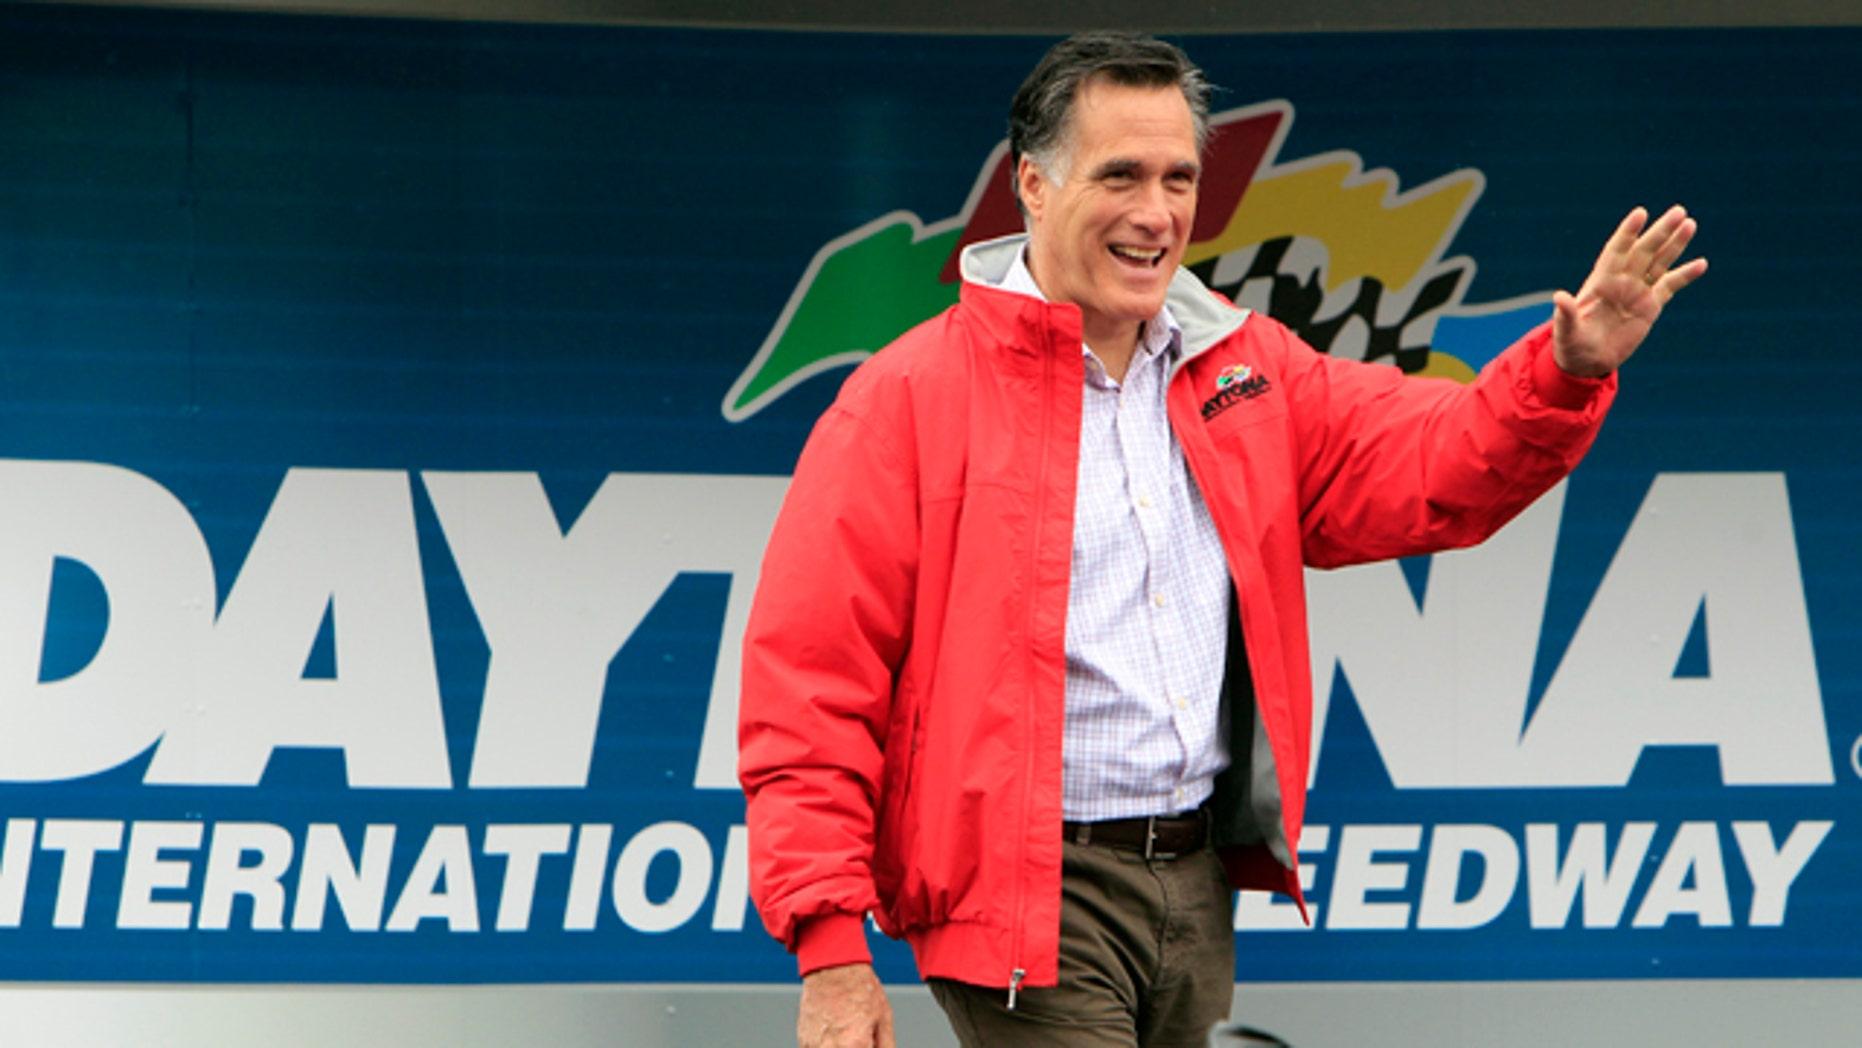 Feb. 26, 2012: Republican presidential candidate, former Massachusetts Gov. Mitt Romney greets fans during activities before the NASCAR Daytona 500 Sprint Cup series auto race at Daytona International Speedway in Daytona Beach, Fla..